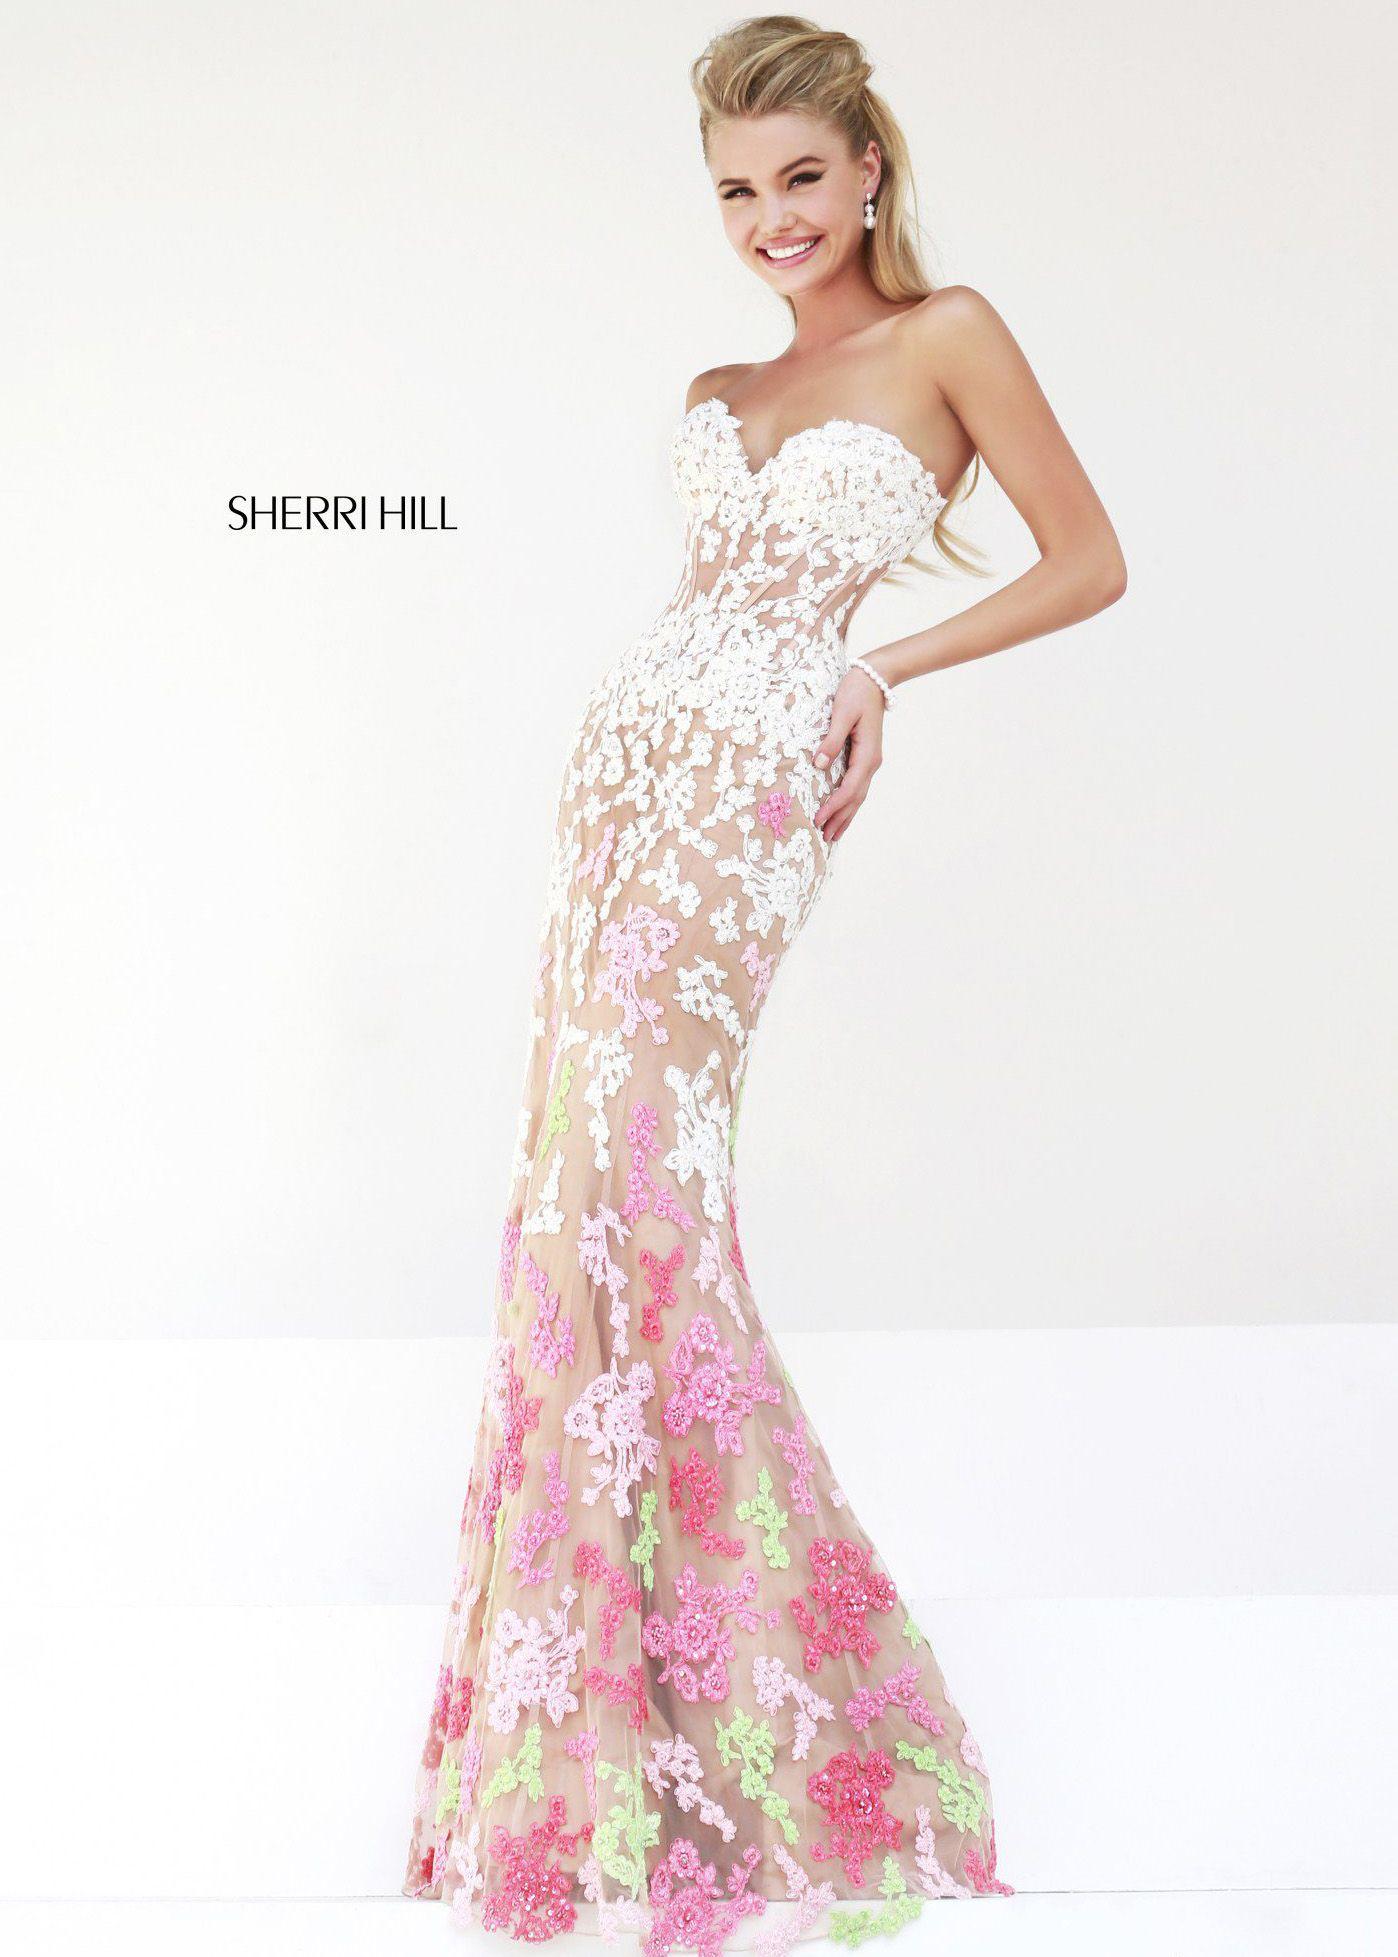 Sherri Hill 11134 - Ivory/Coral Lace Mermaid Prom Dresses Online ...